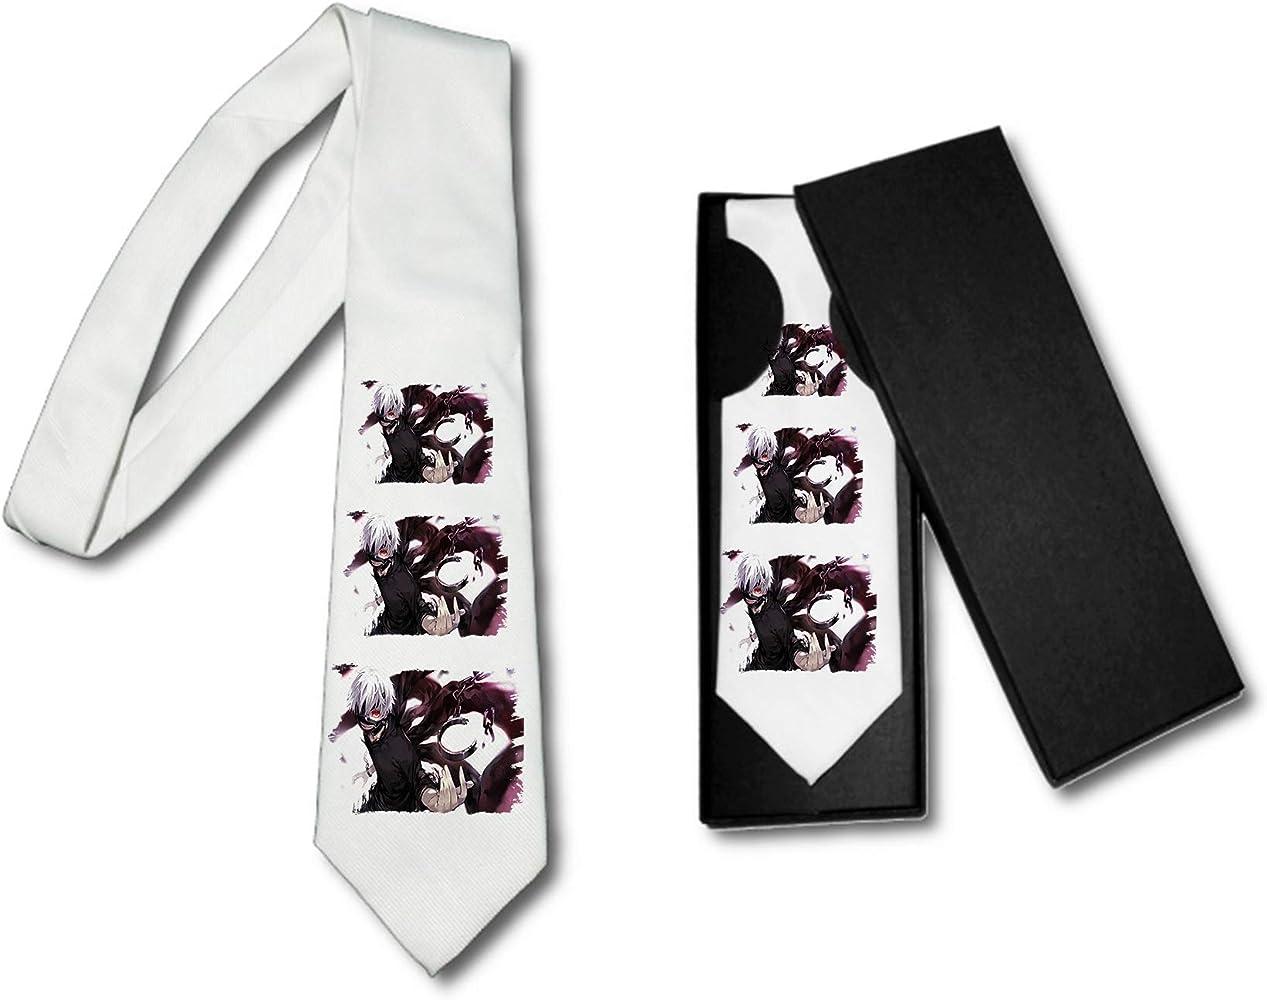 Corbata Elegante Tokyo Ghoul HEROE Anime Vampiro Suave Poliester ...